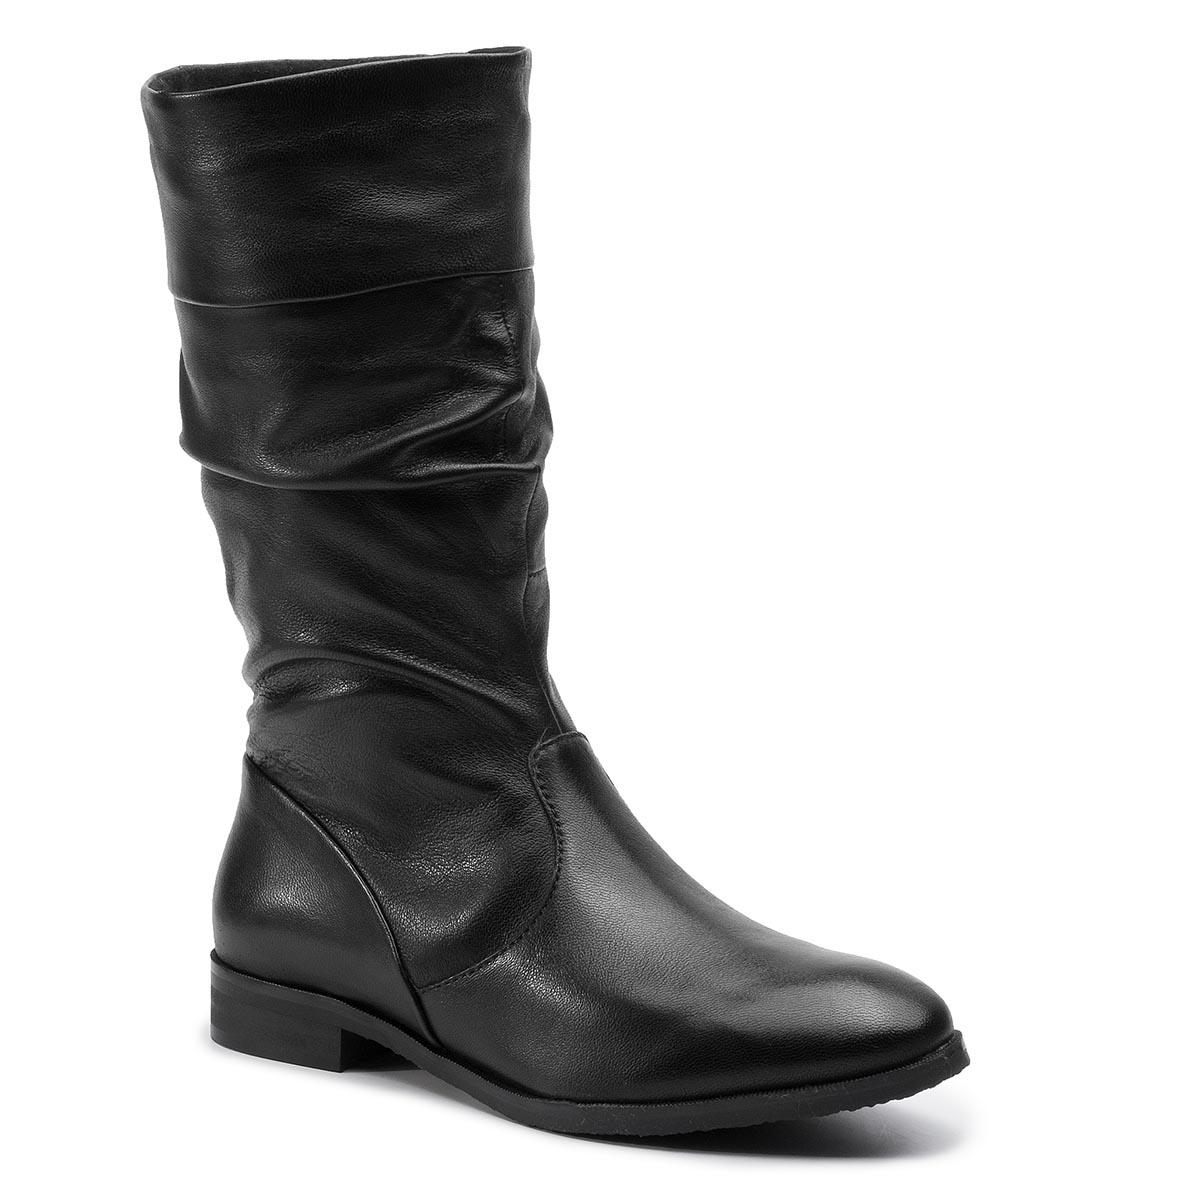 Image of Stiefel CAPRICE - 9-25328-23 Black Nappa 022